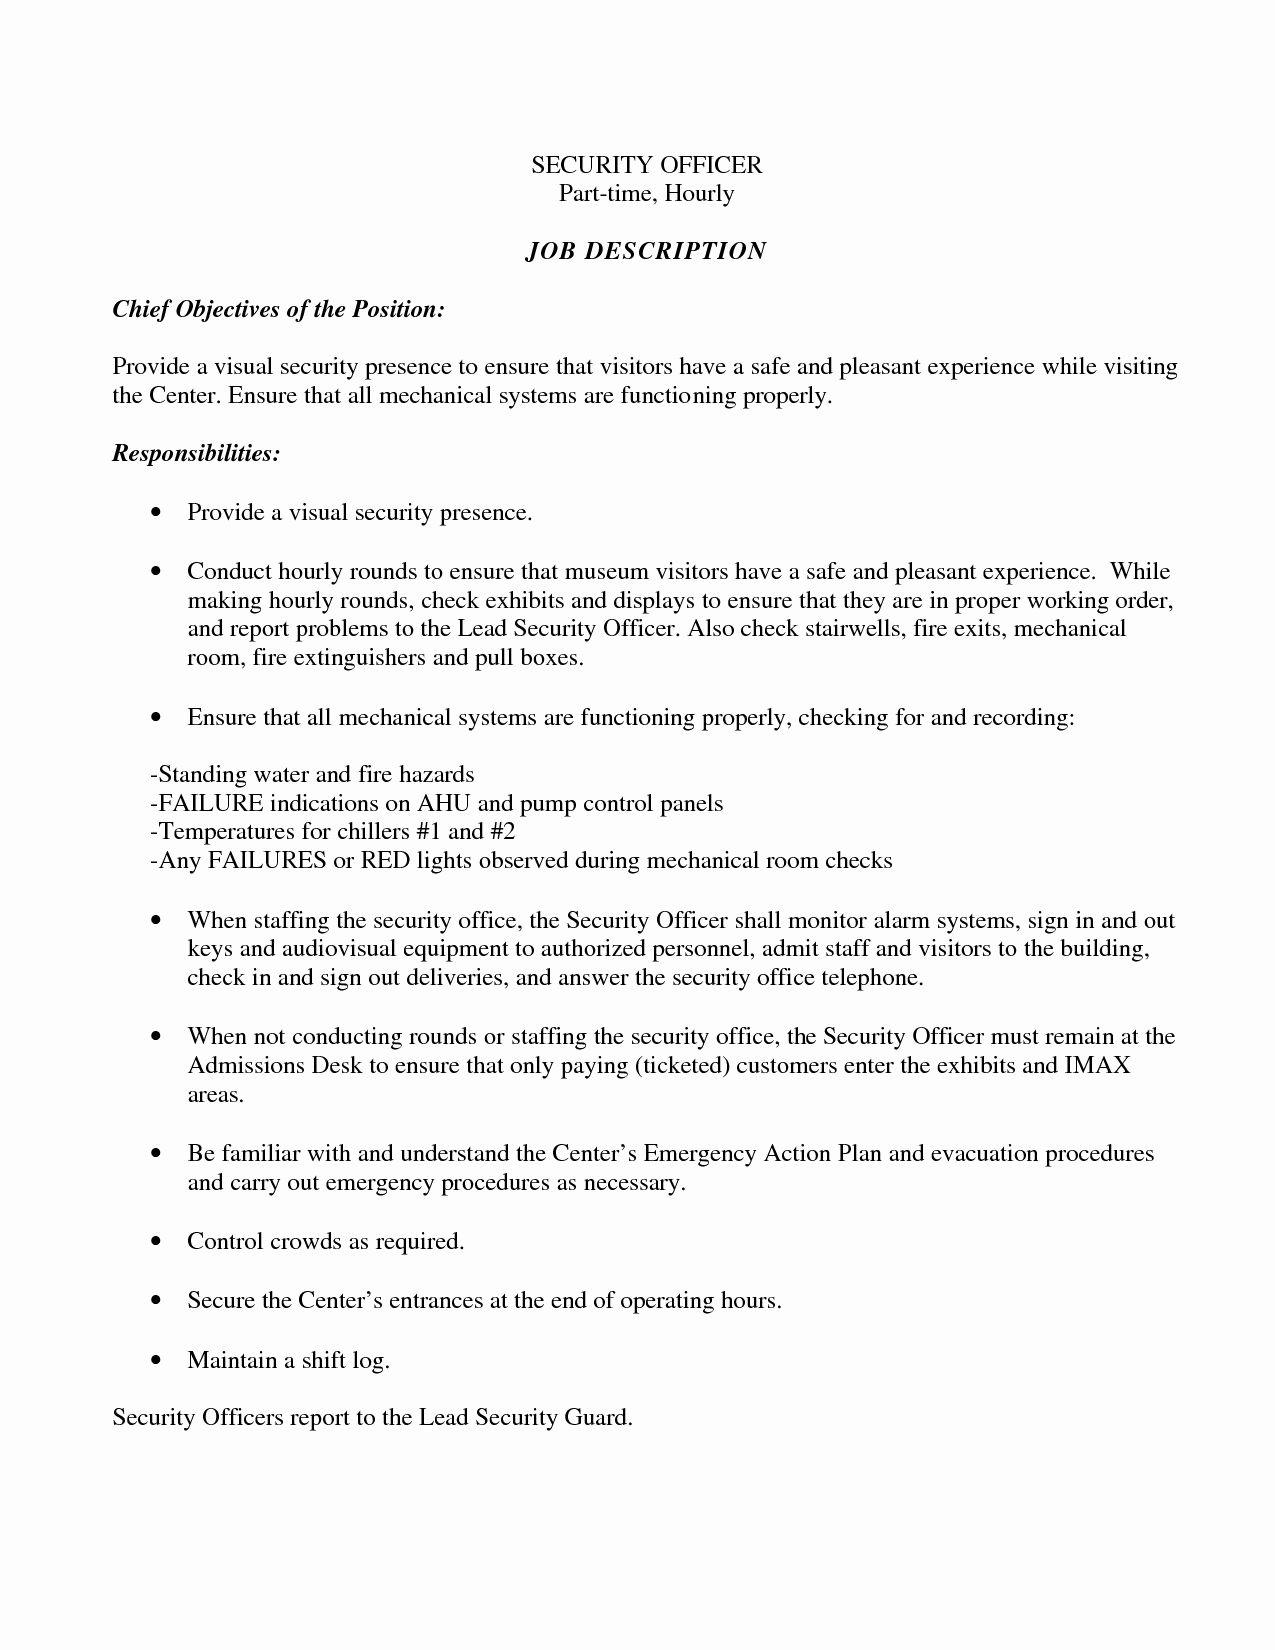 Part Time Job Resume Fresh Cover Letter Part Time Job